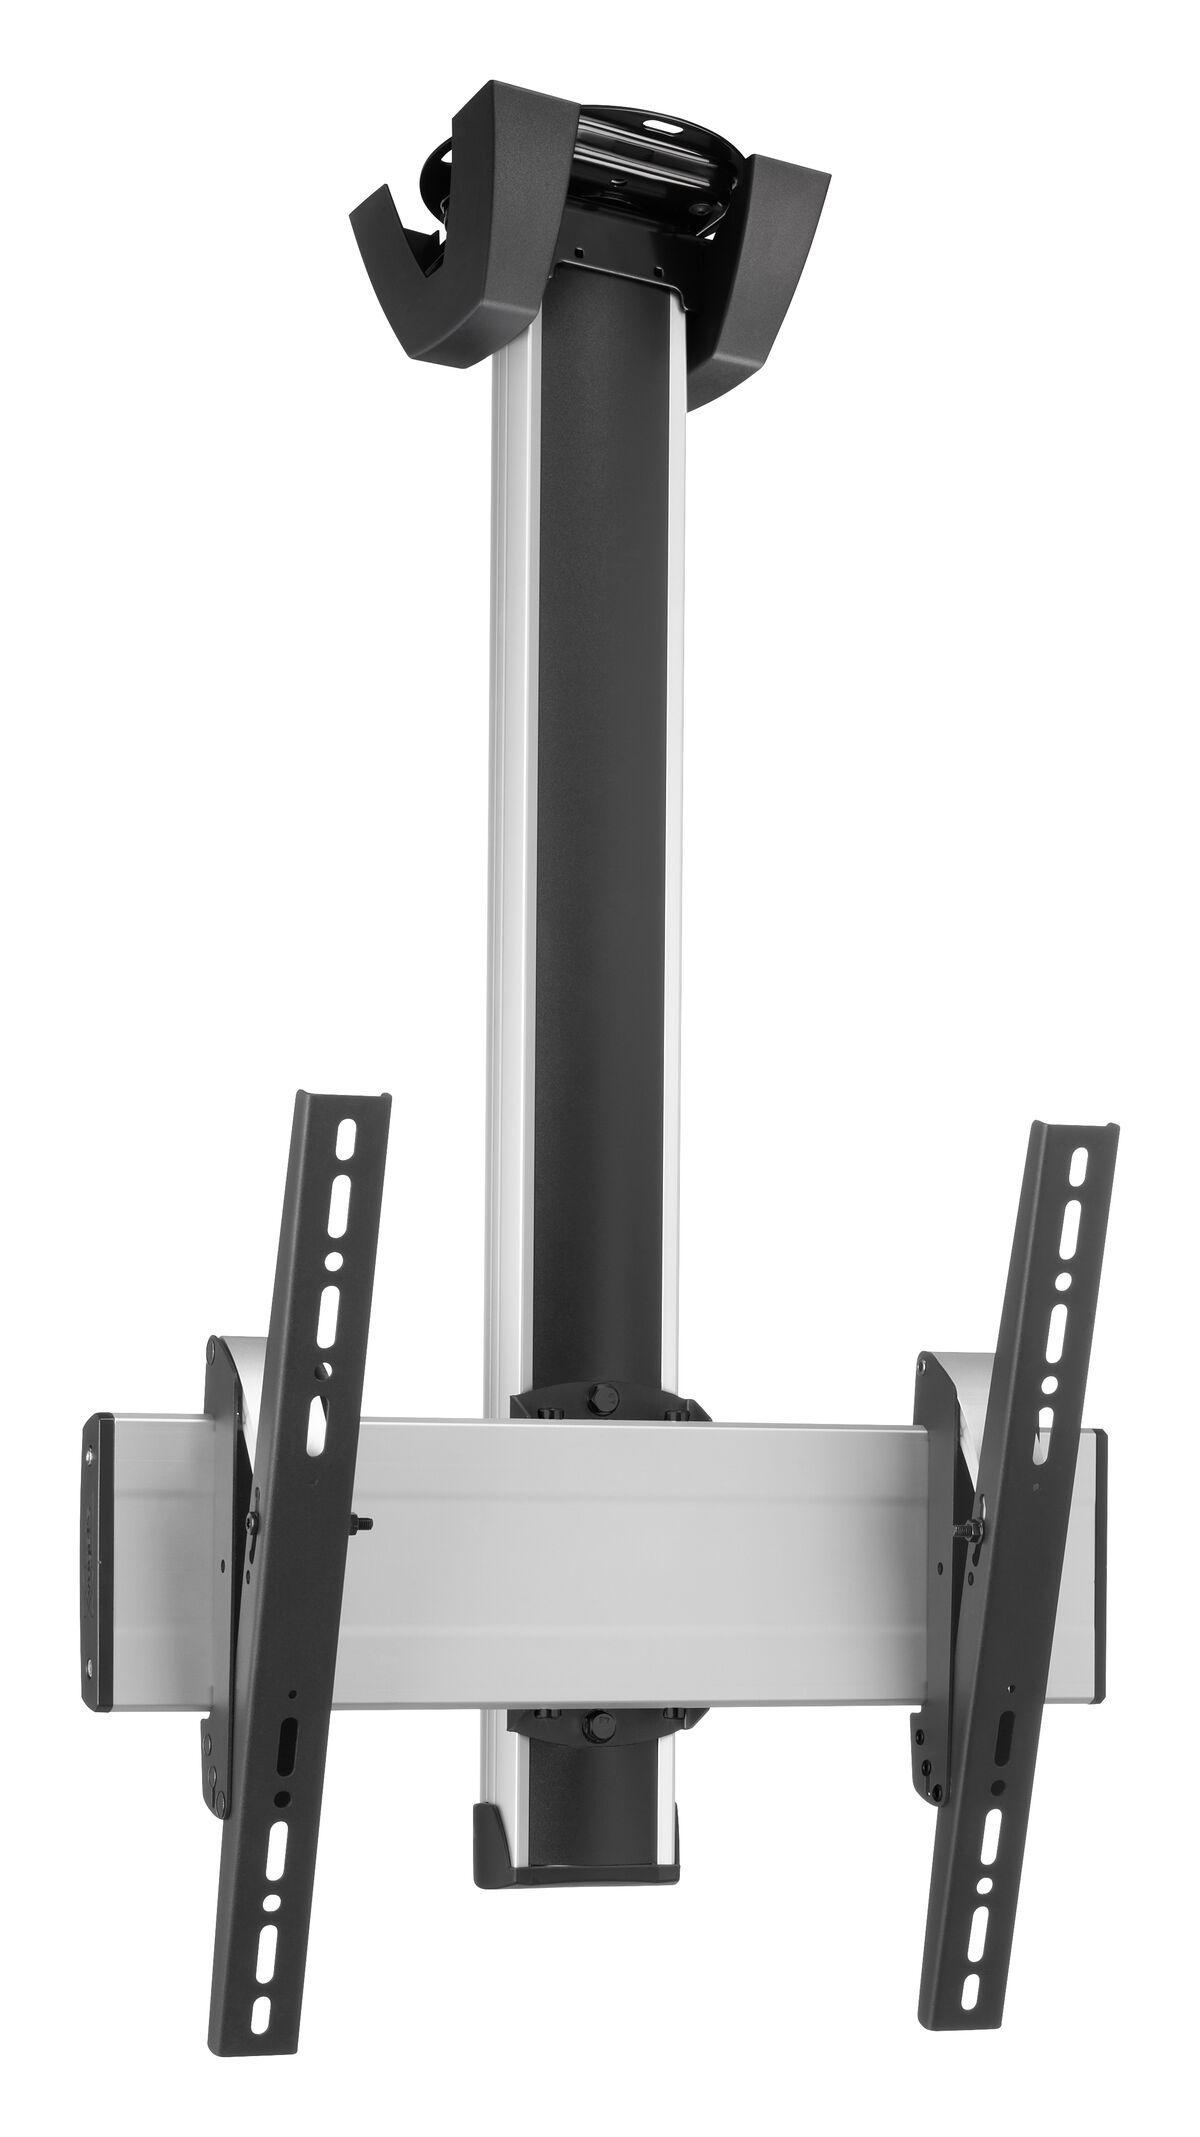 Vogel's CT0844S Supporto a soffitto fisso - Product